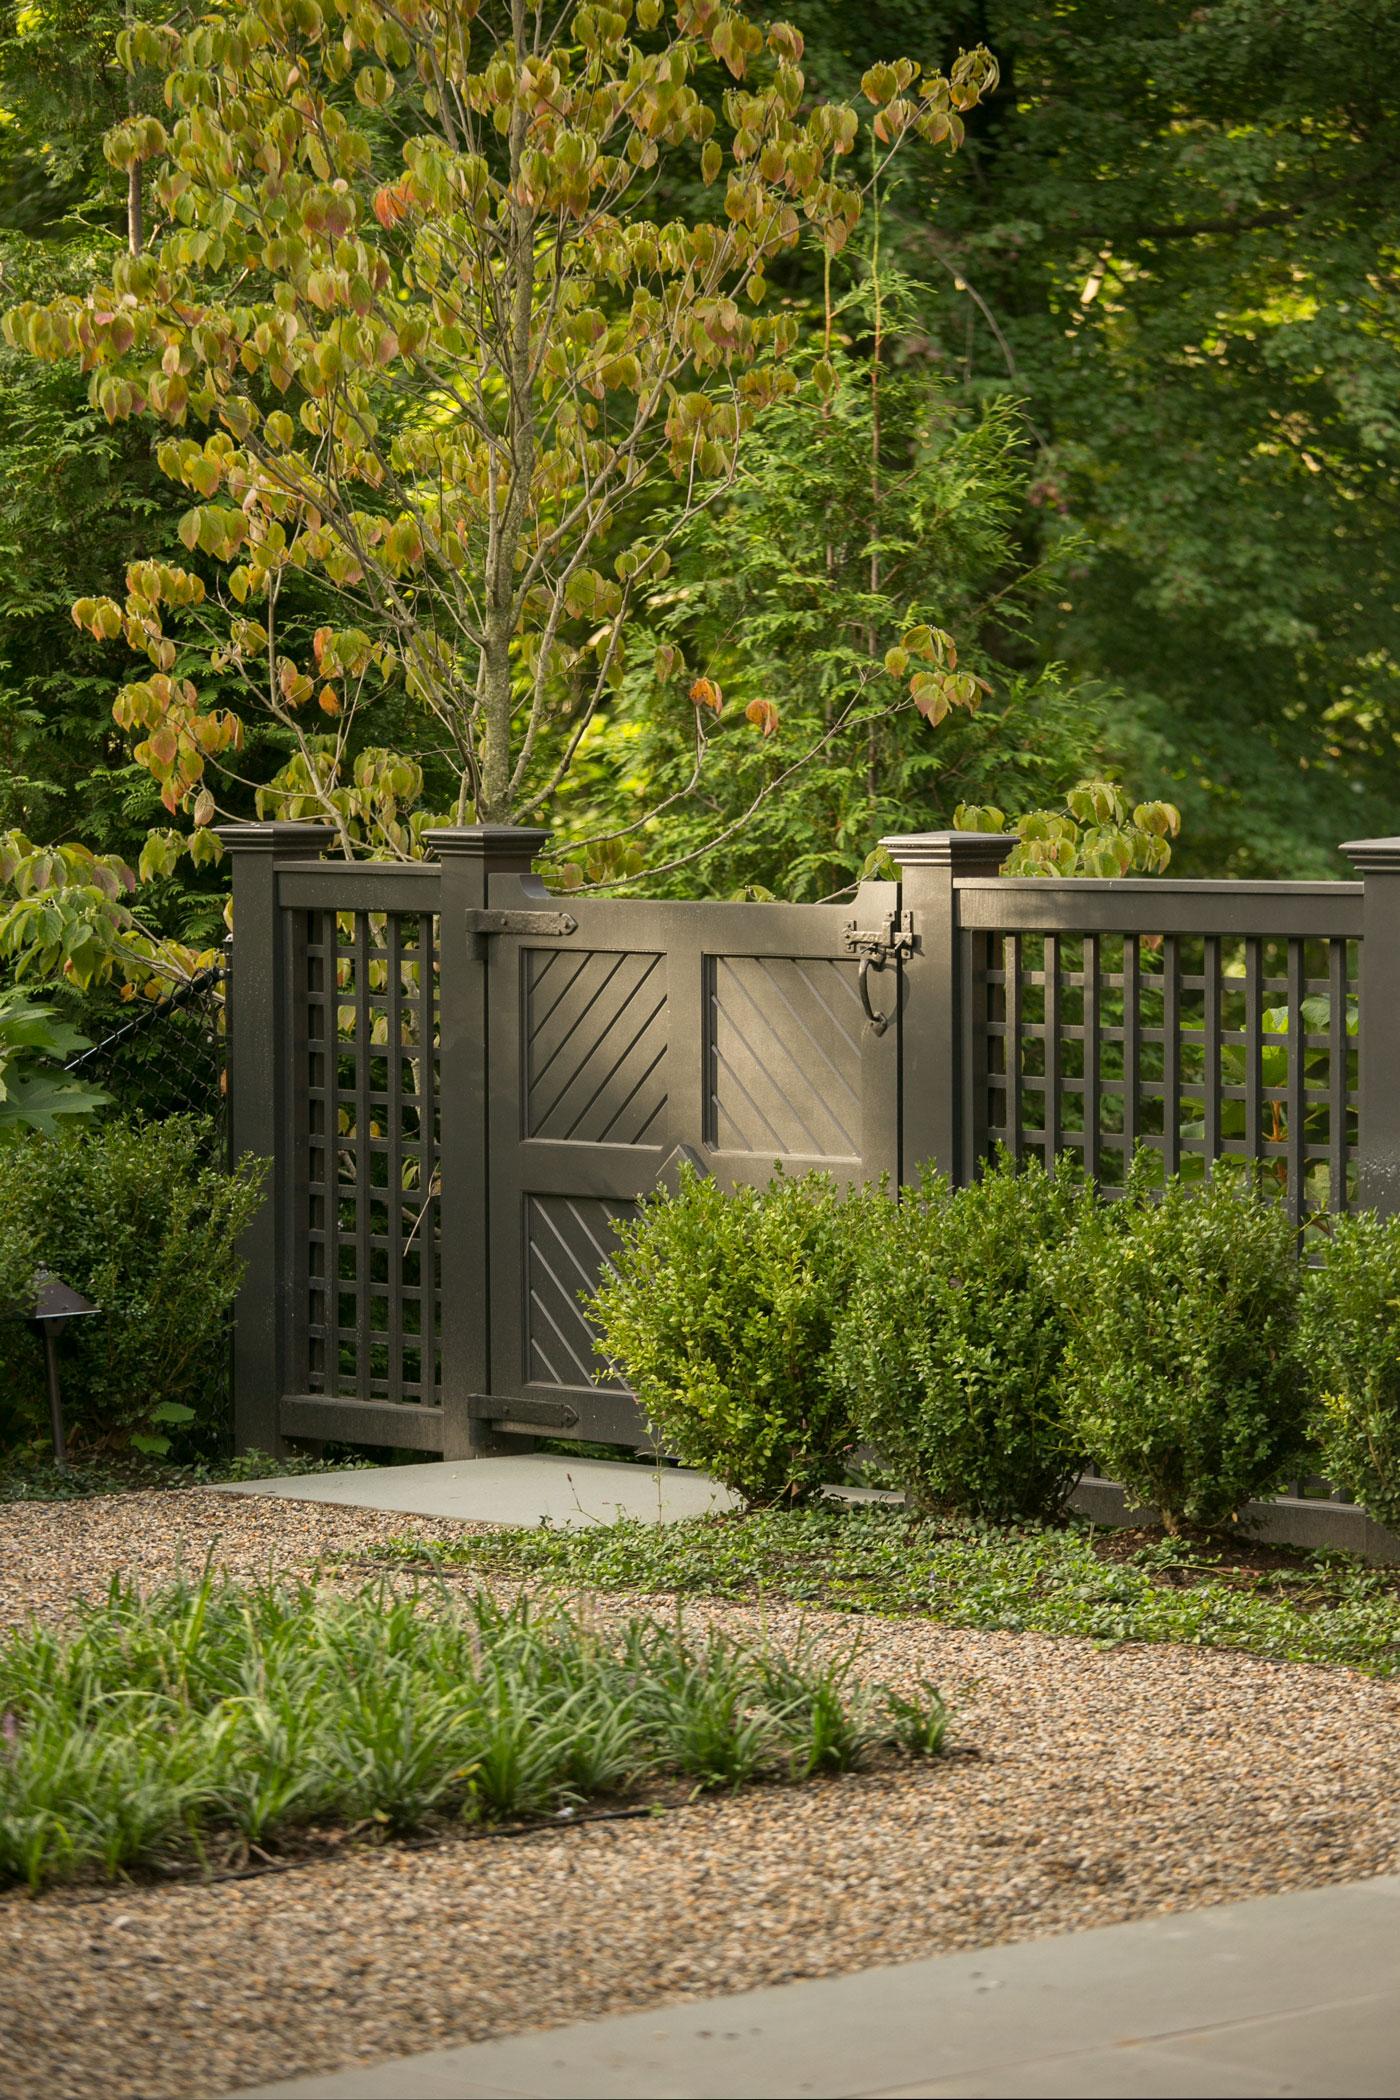 Gated landscape design by Dan Gordon Landscape Architects